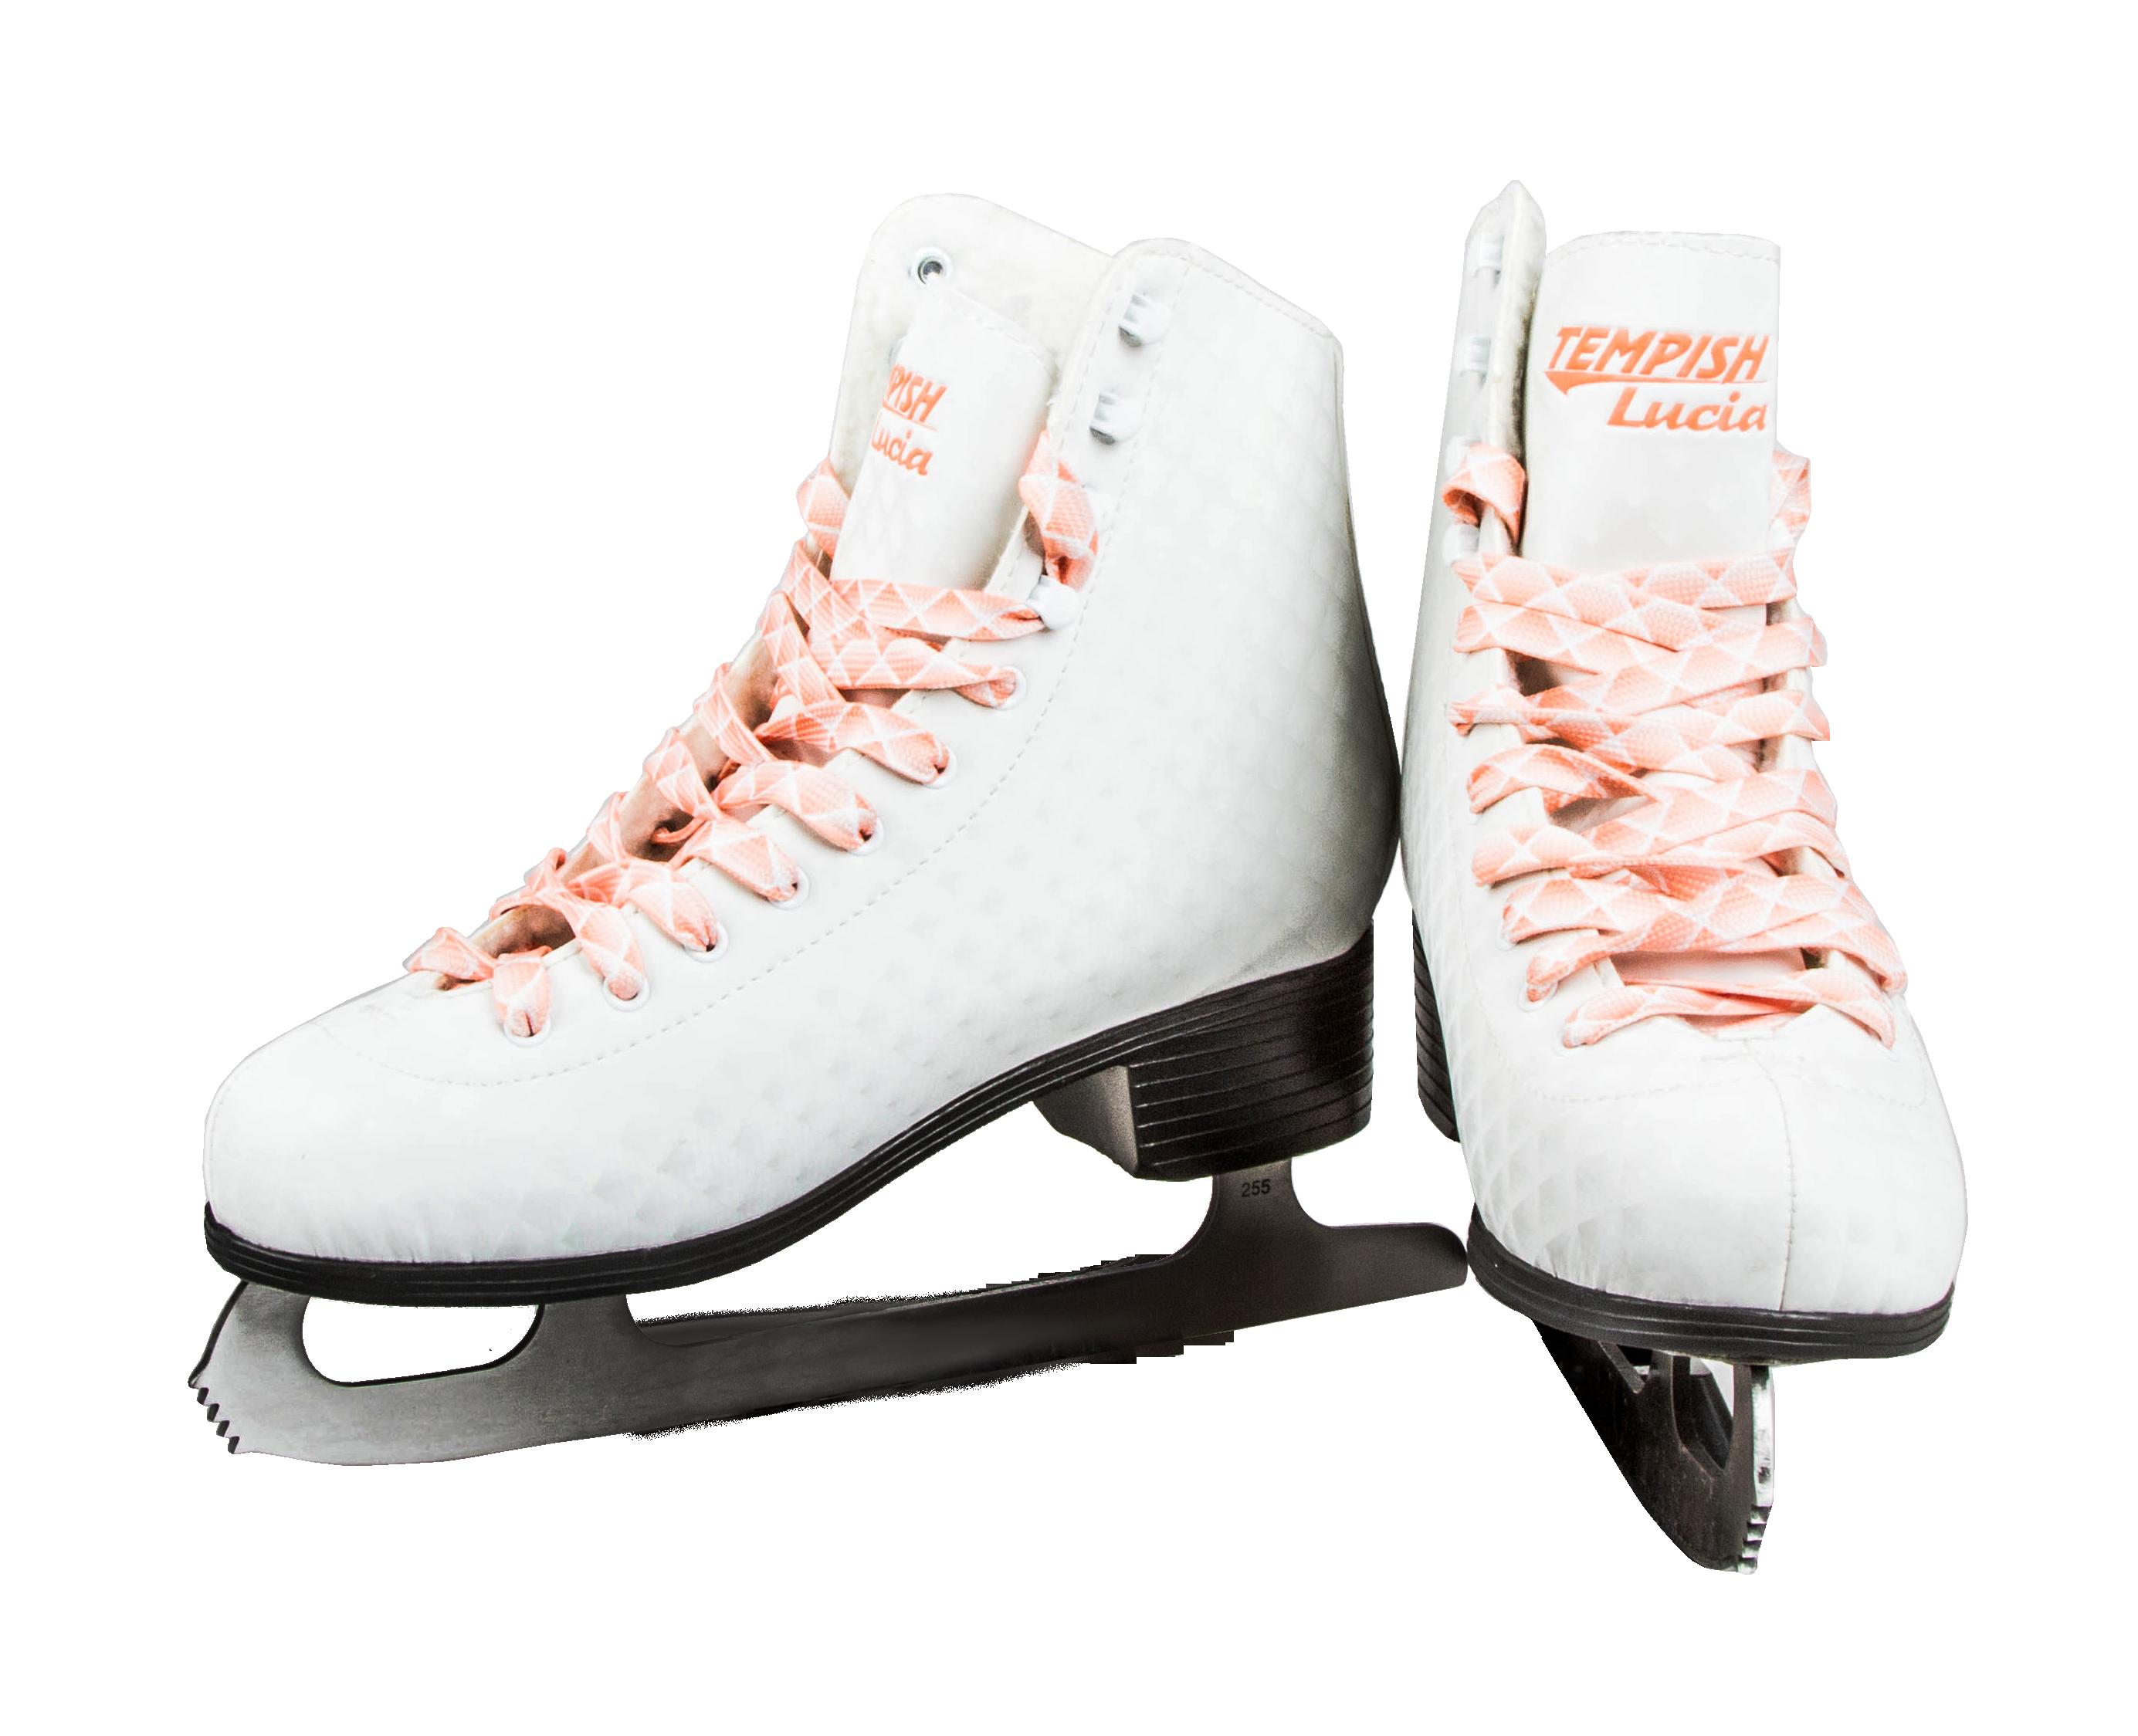 Znalezione Obrazy Dla Zapytania Lyzwy Damskie High Top Sneakers Converse Chuck Taylor High Top Sneaker Converse High Top Sneaker